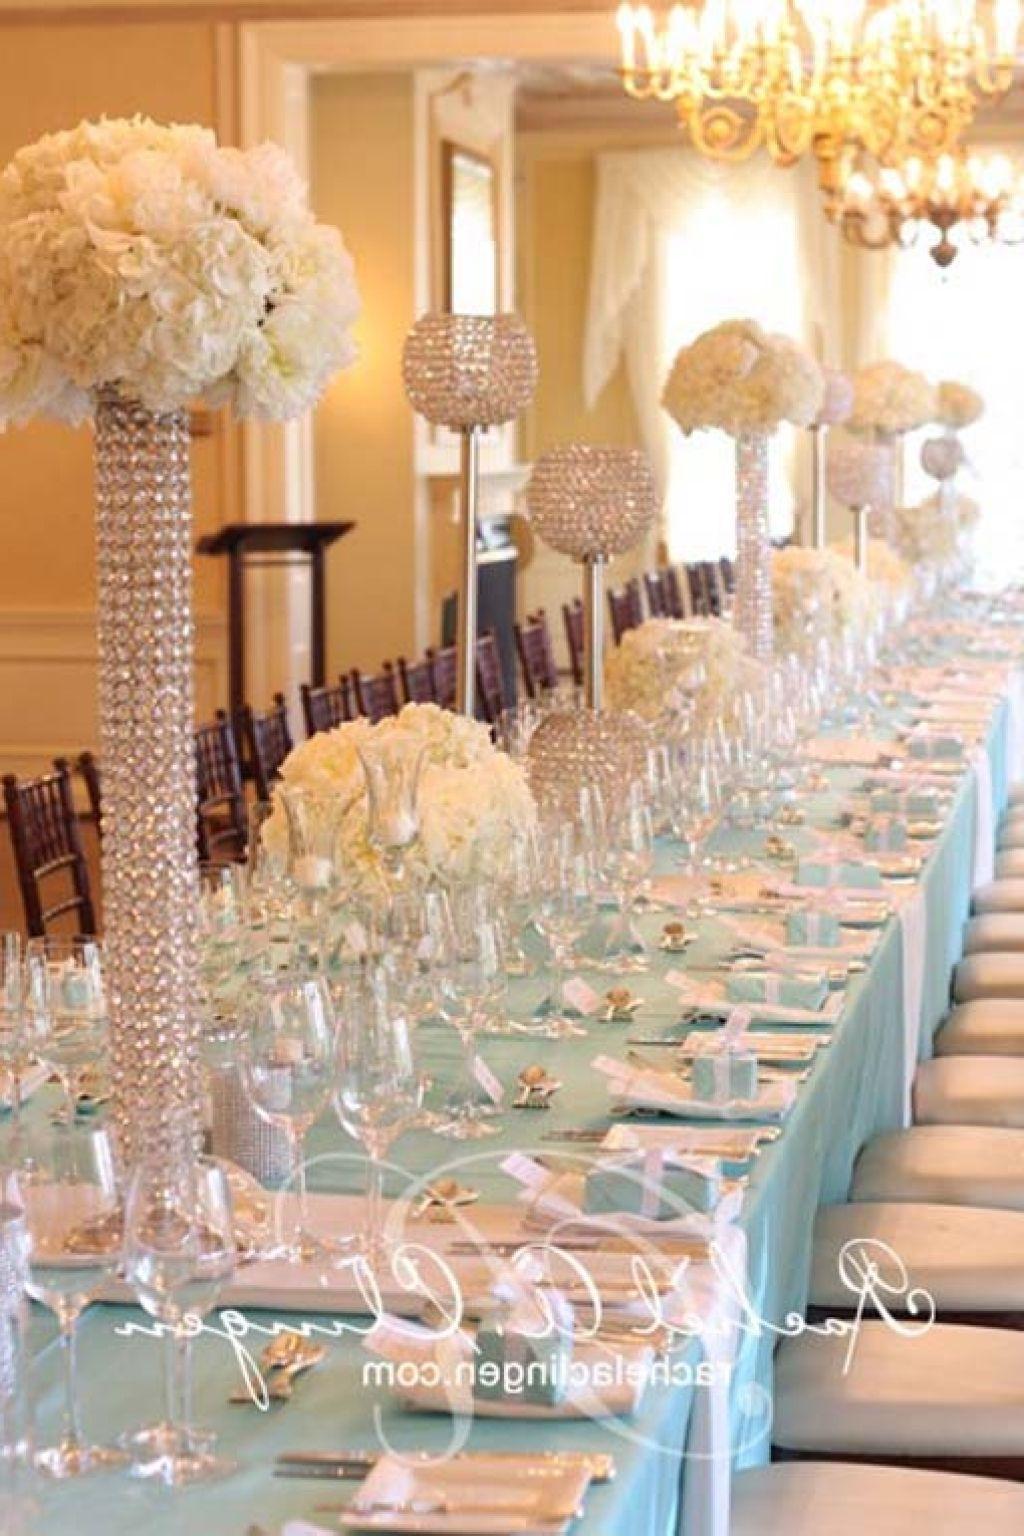 Wedding Centerpieces On A Budget Of Perfect Wedding Decor Ideas